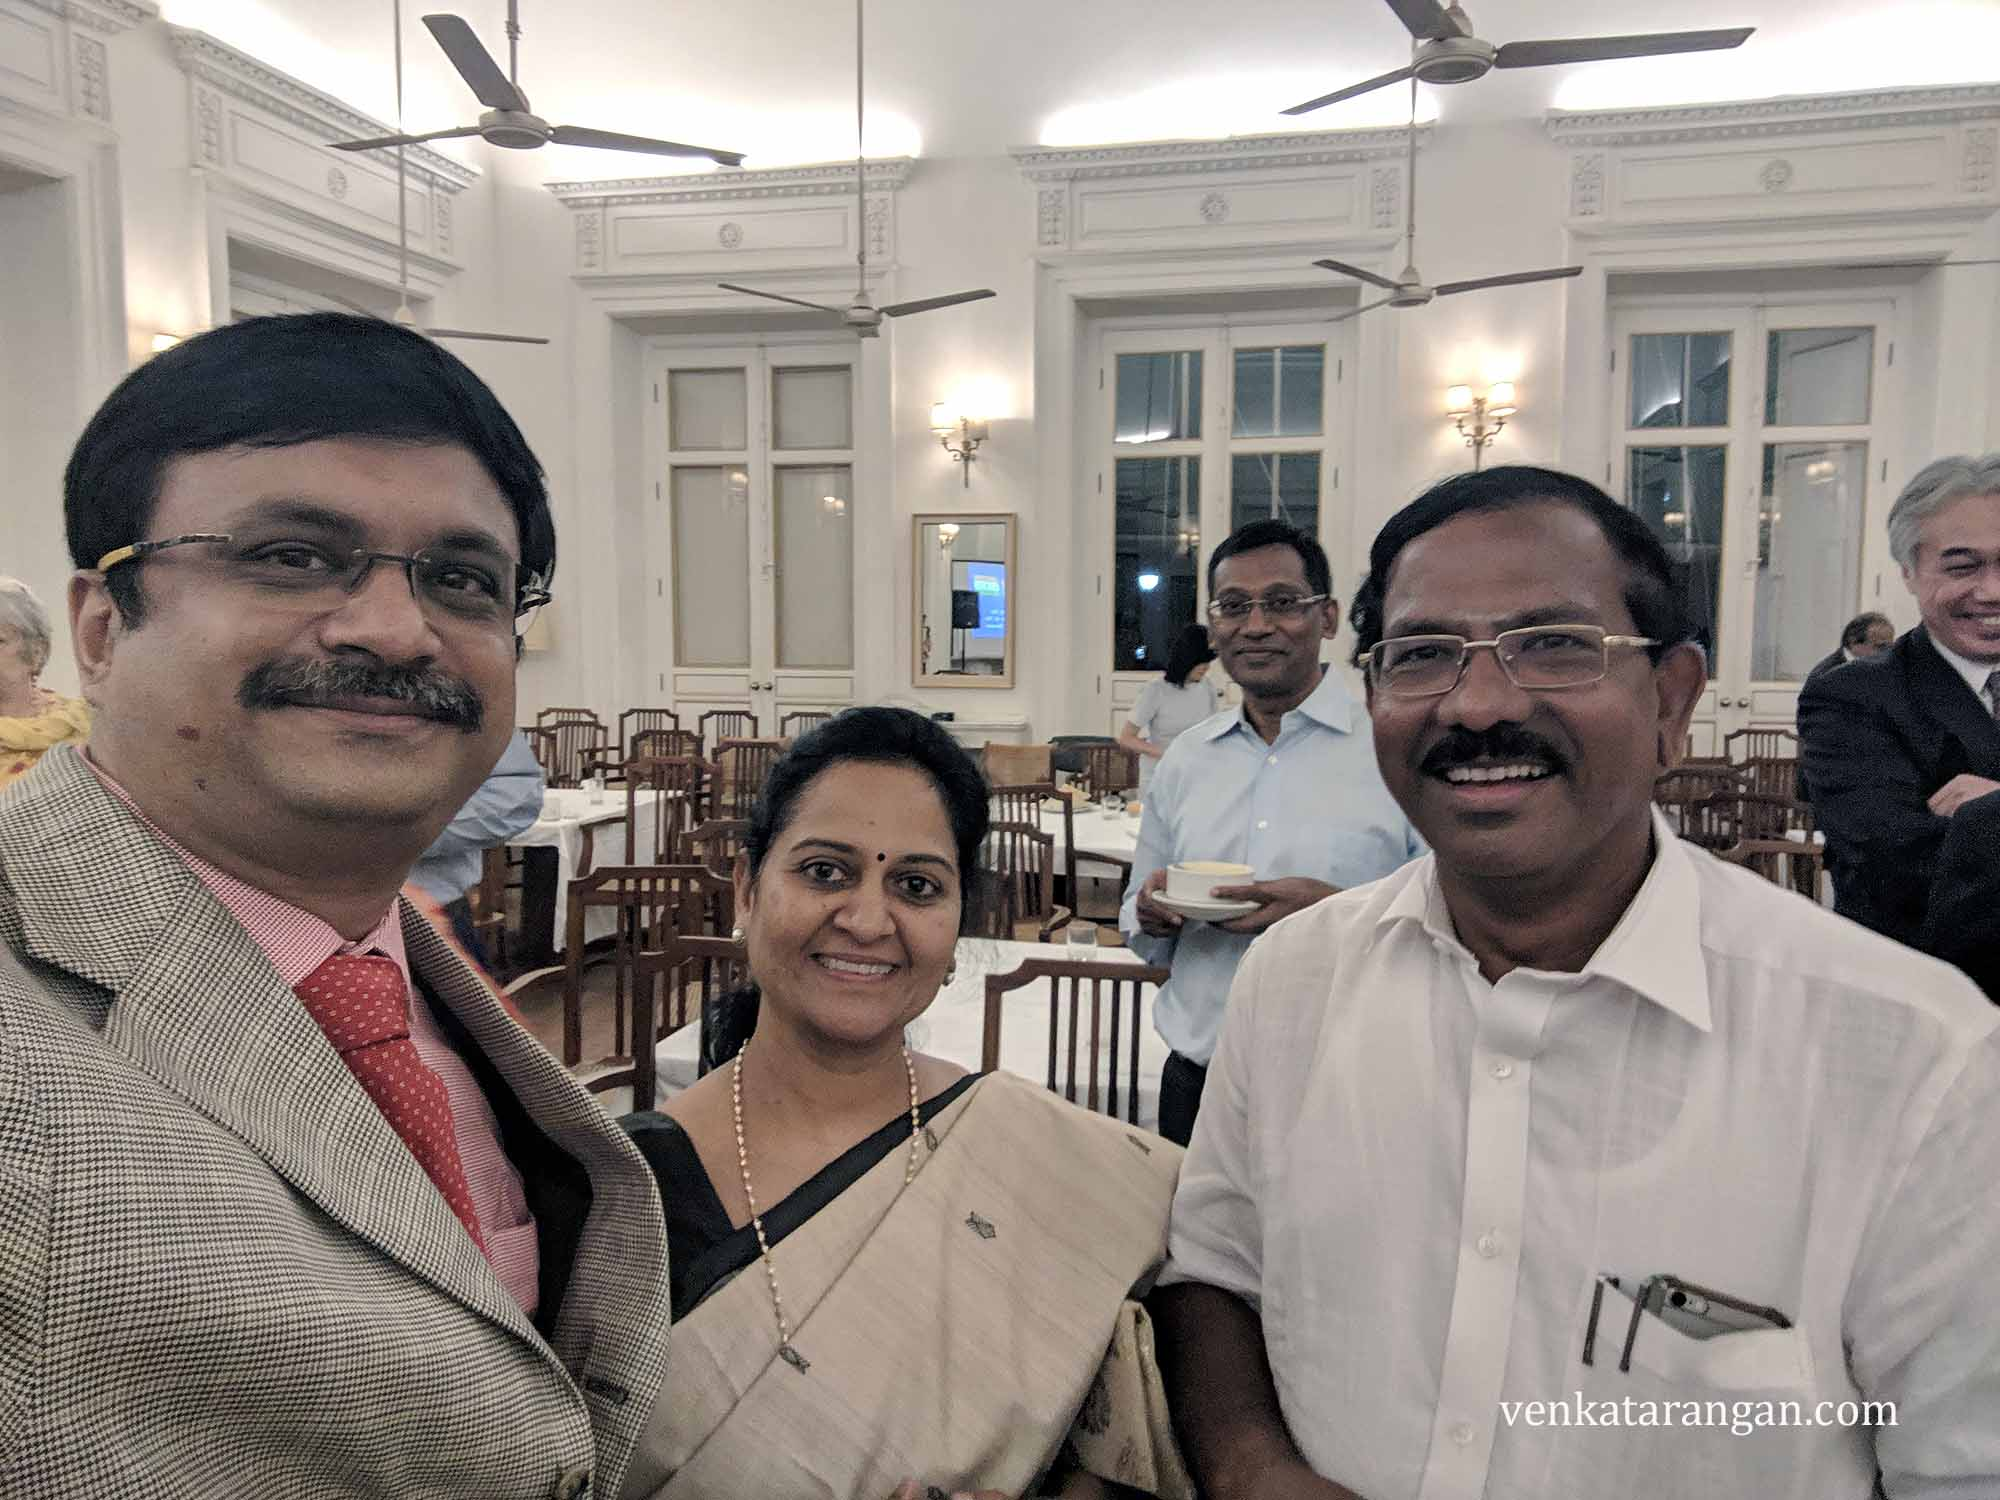 Mrs Latha Pandiarajan (Co-Founder of Mafoi) and Mr K Pandiarajan (Hon'ble Minister of Tamil Nadu)